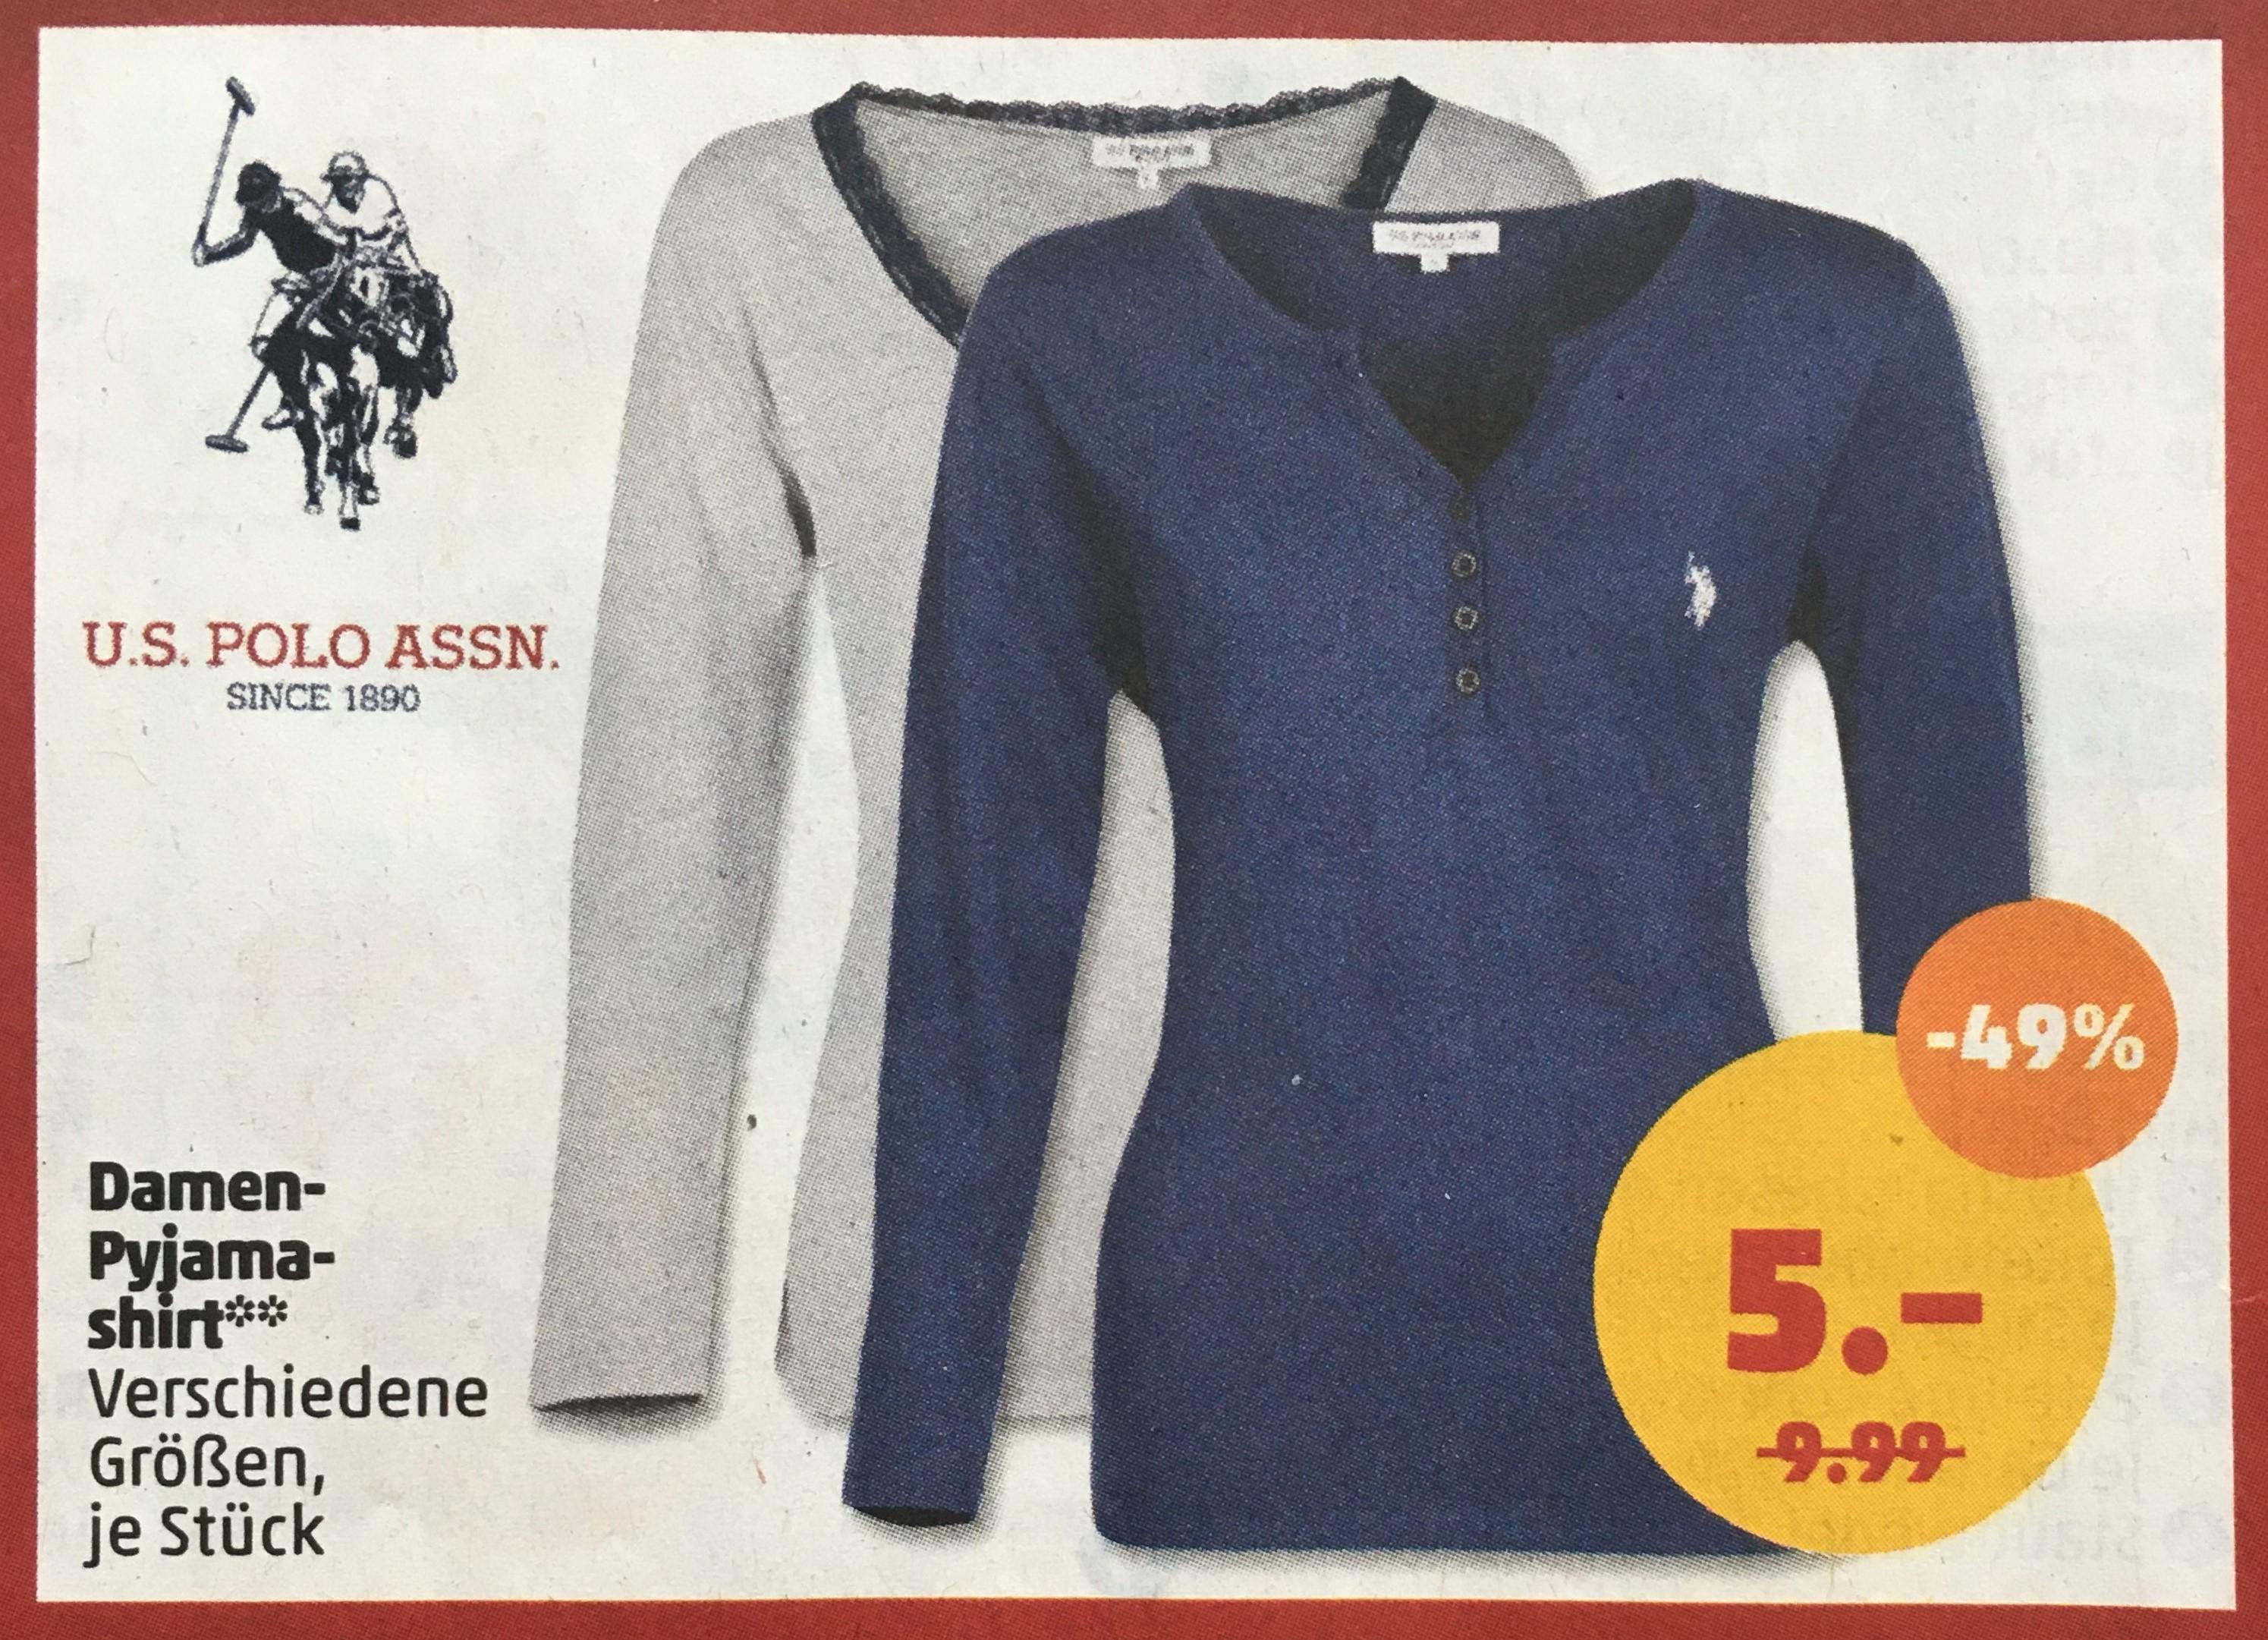 U.S. POLO ASSN Damen Pyjamashirts [Penny Limburg a. d. Lahn]